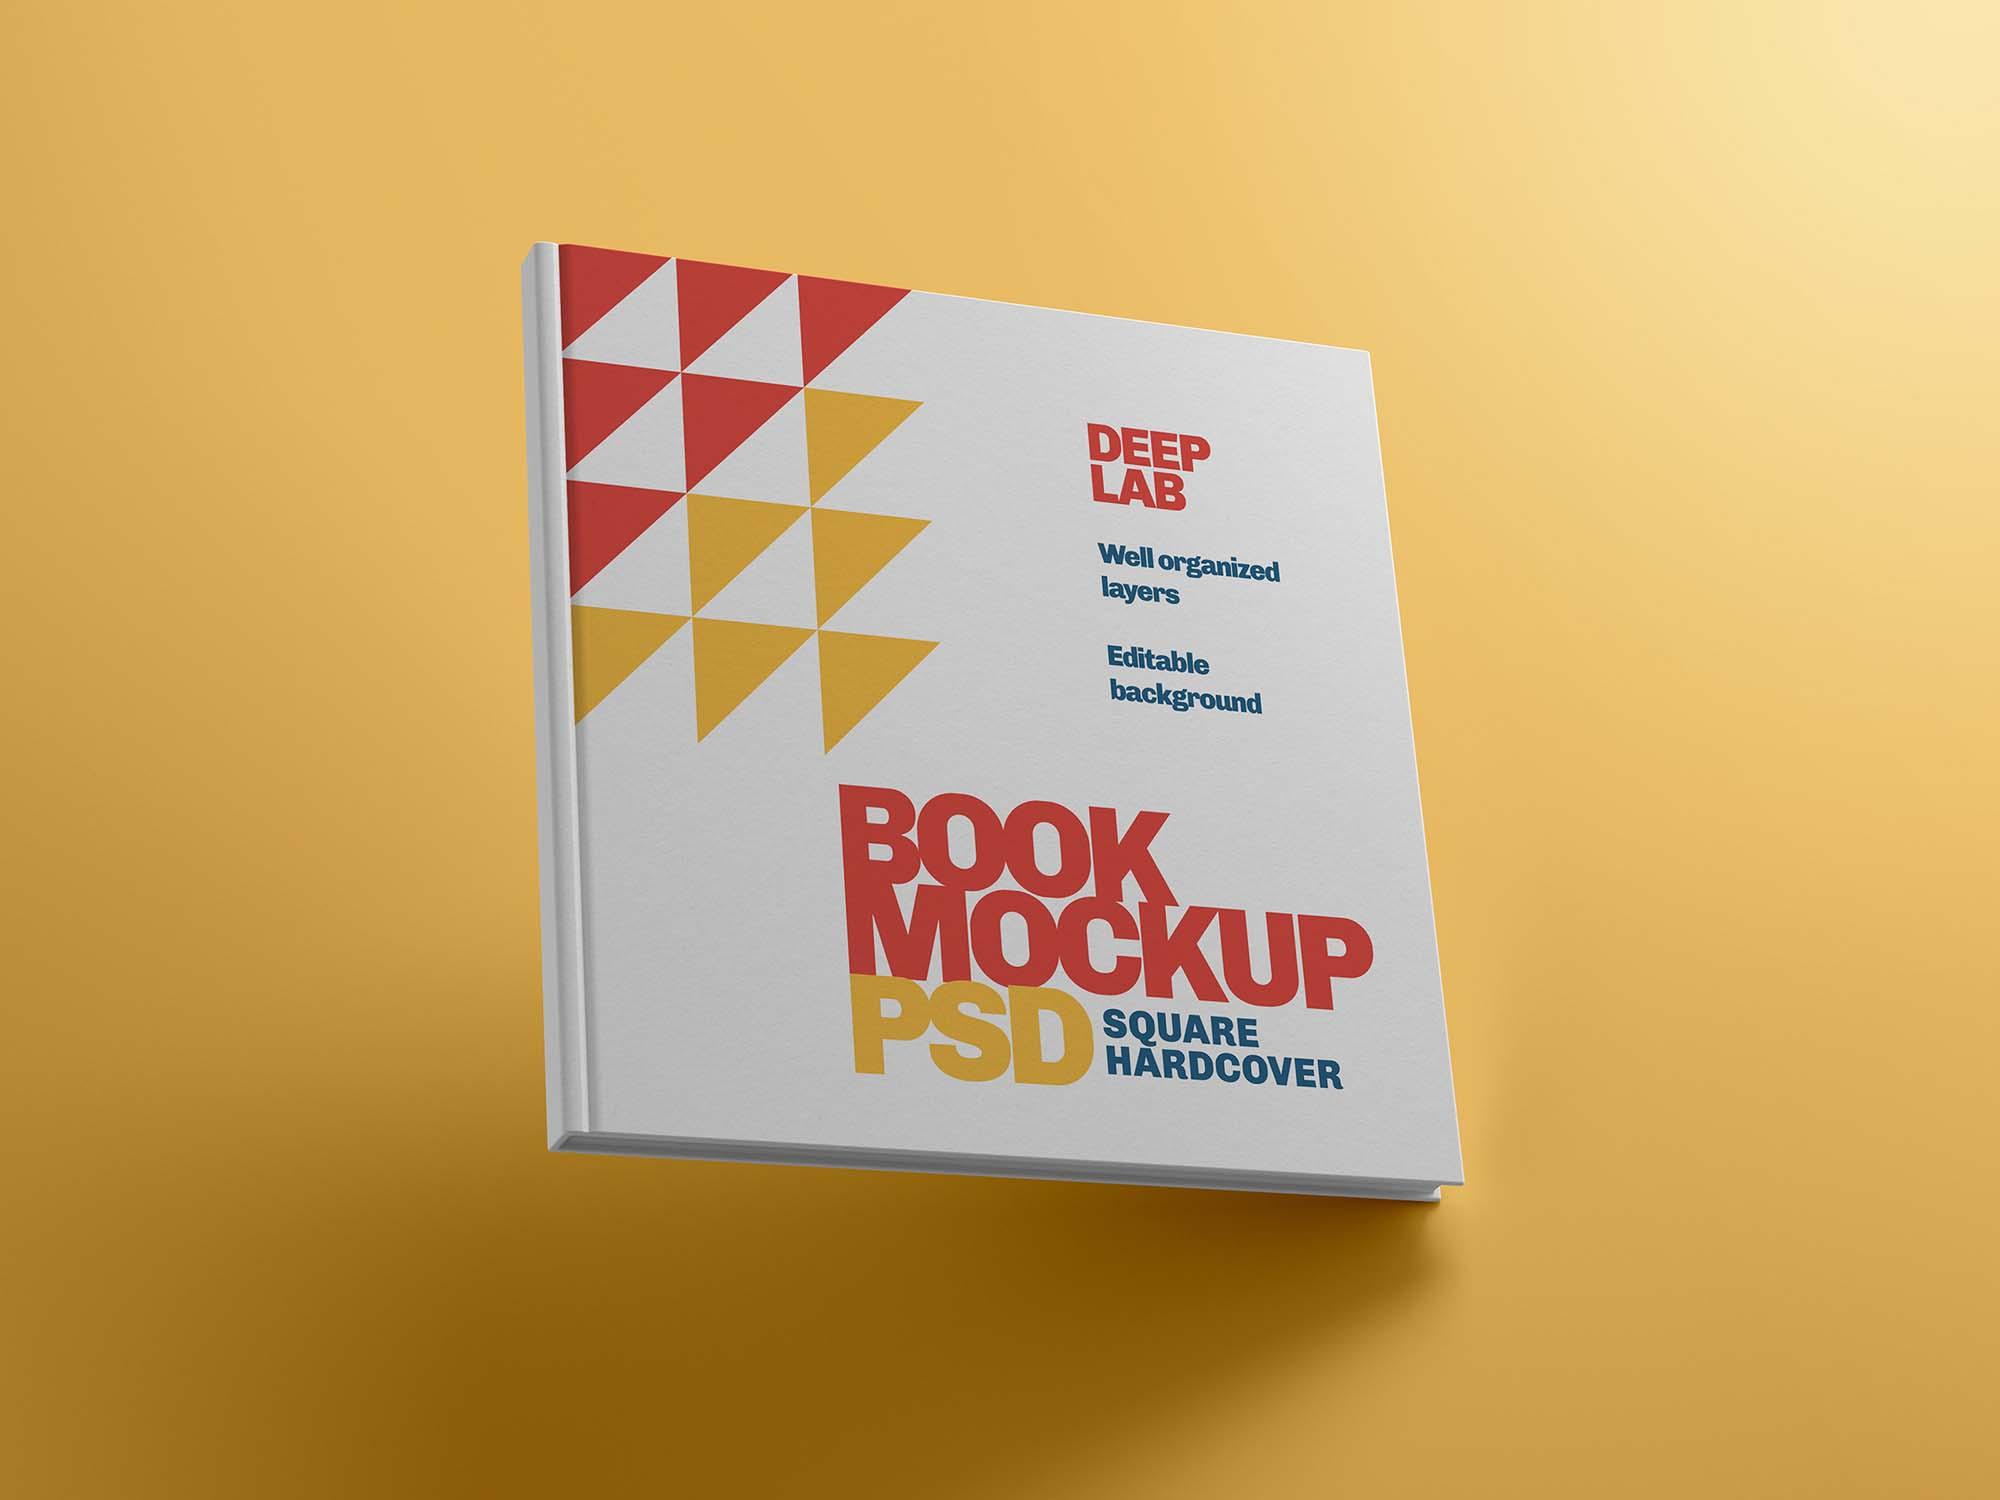 Square Hardcover Book